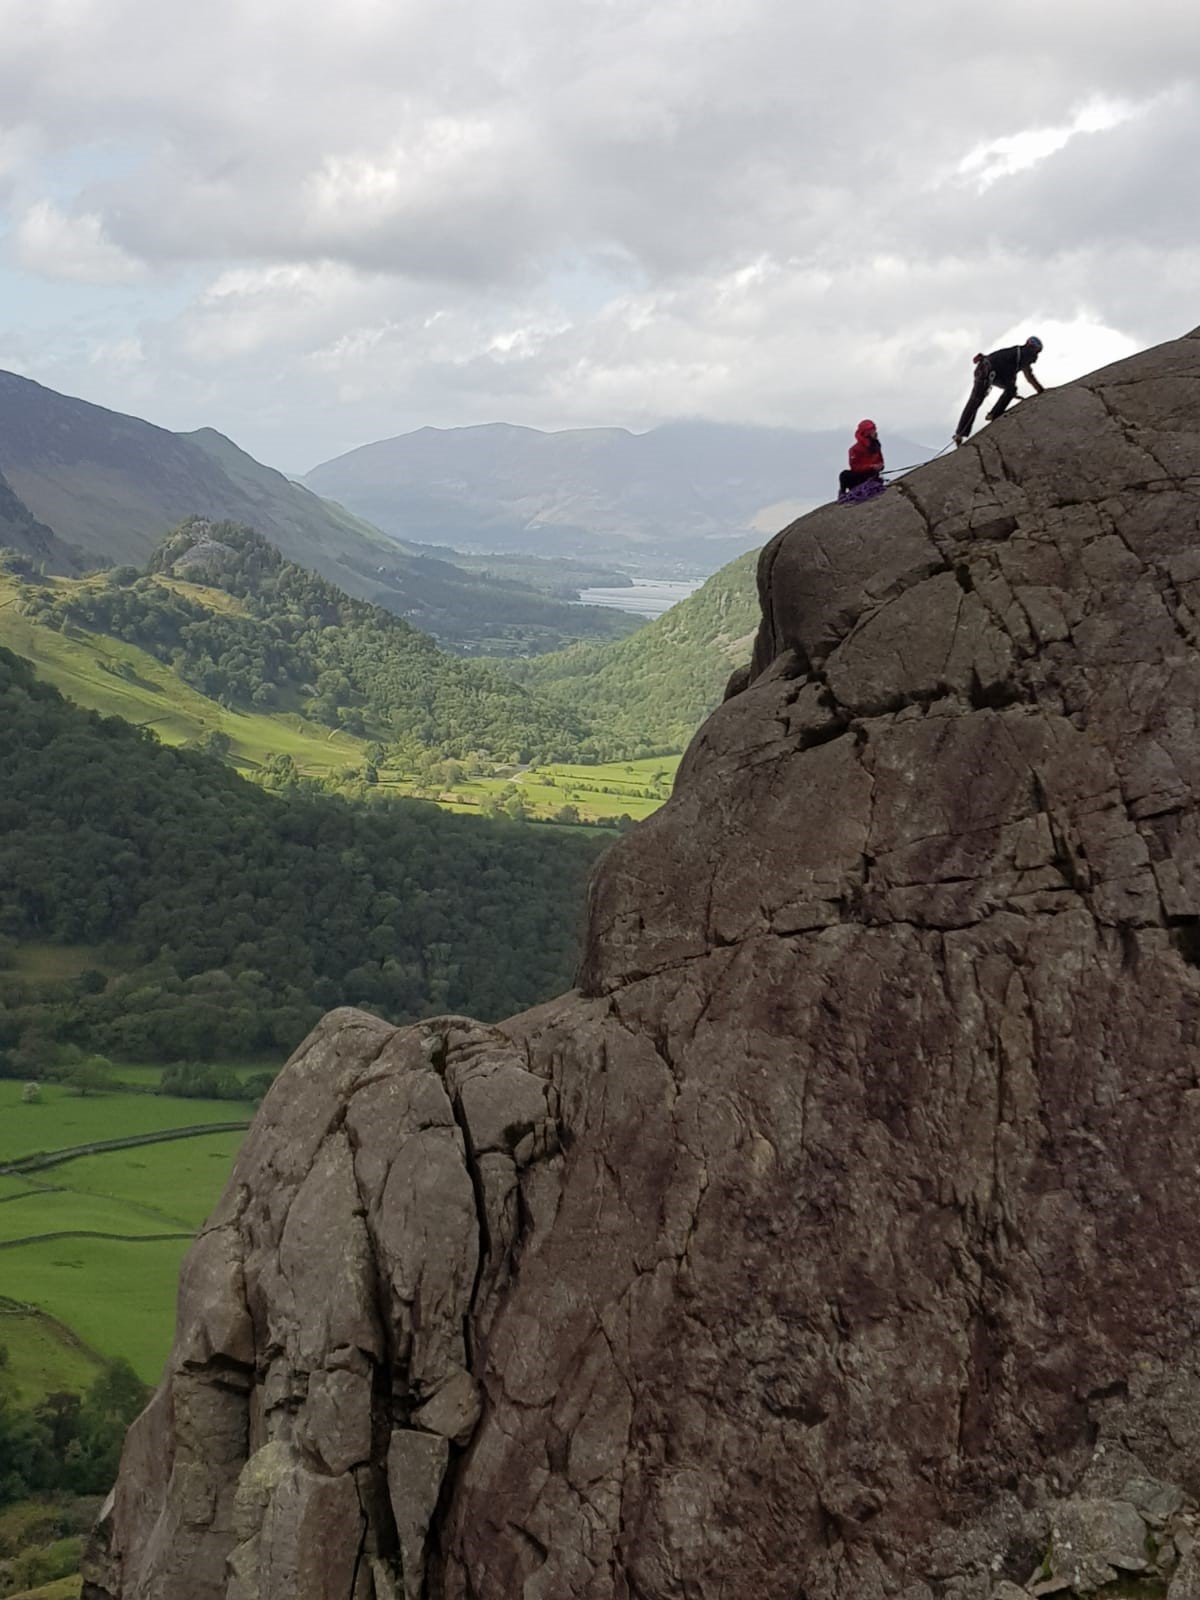 Borrowdale Climbing